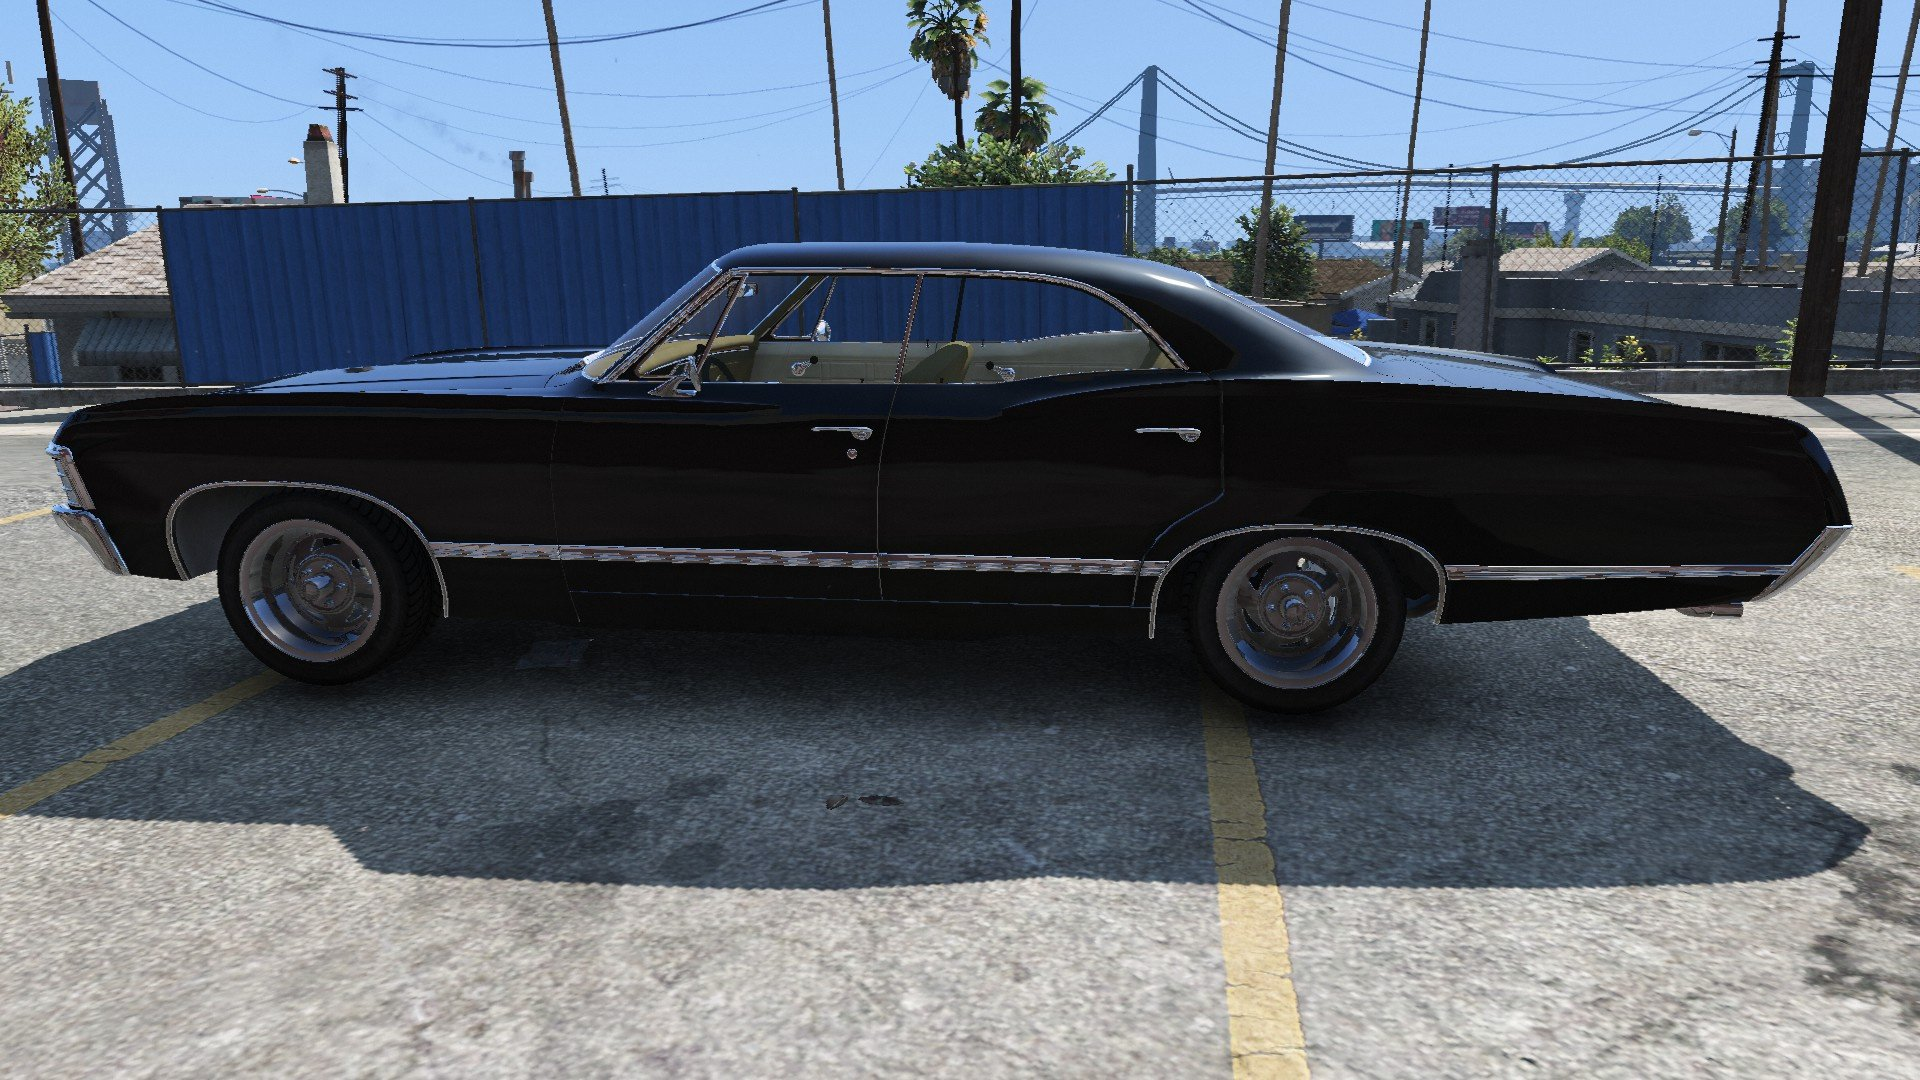 chevrolet impala 1967 vehicules pour gta v sur gta modding. Black Bedroom Furniture Sets. Home Design Ideas